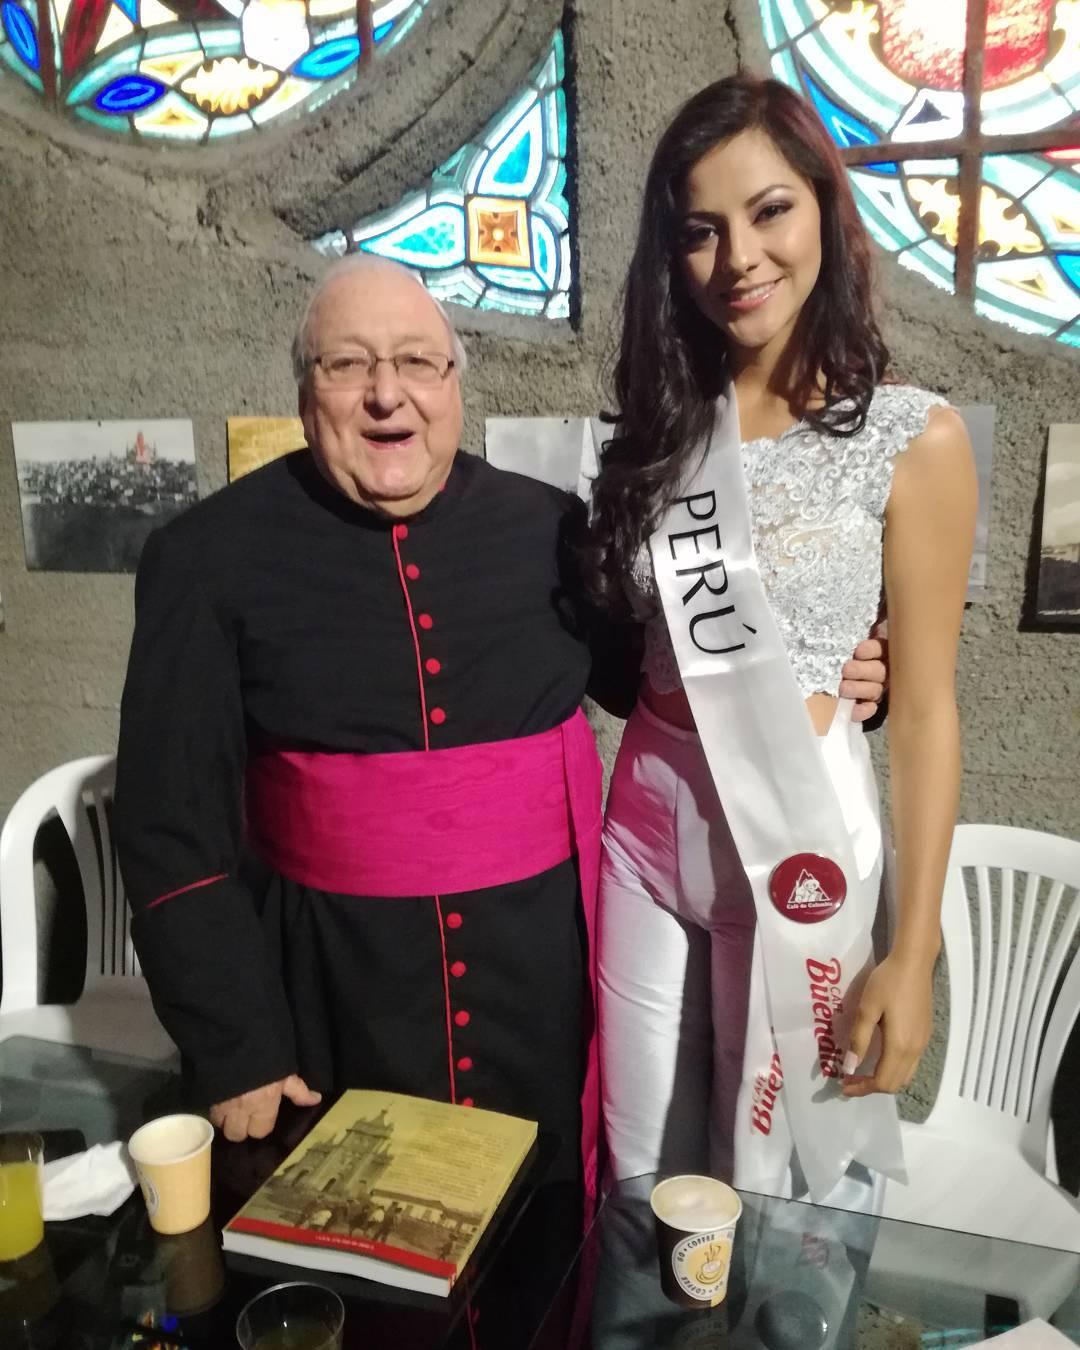 gabriela lambruschini, miss peru reyna internacional cafe 2018. - Página 5 26275710